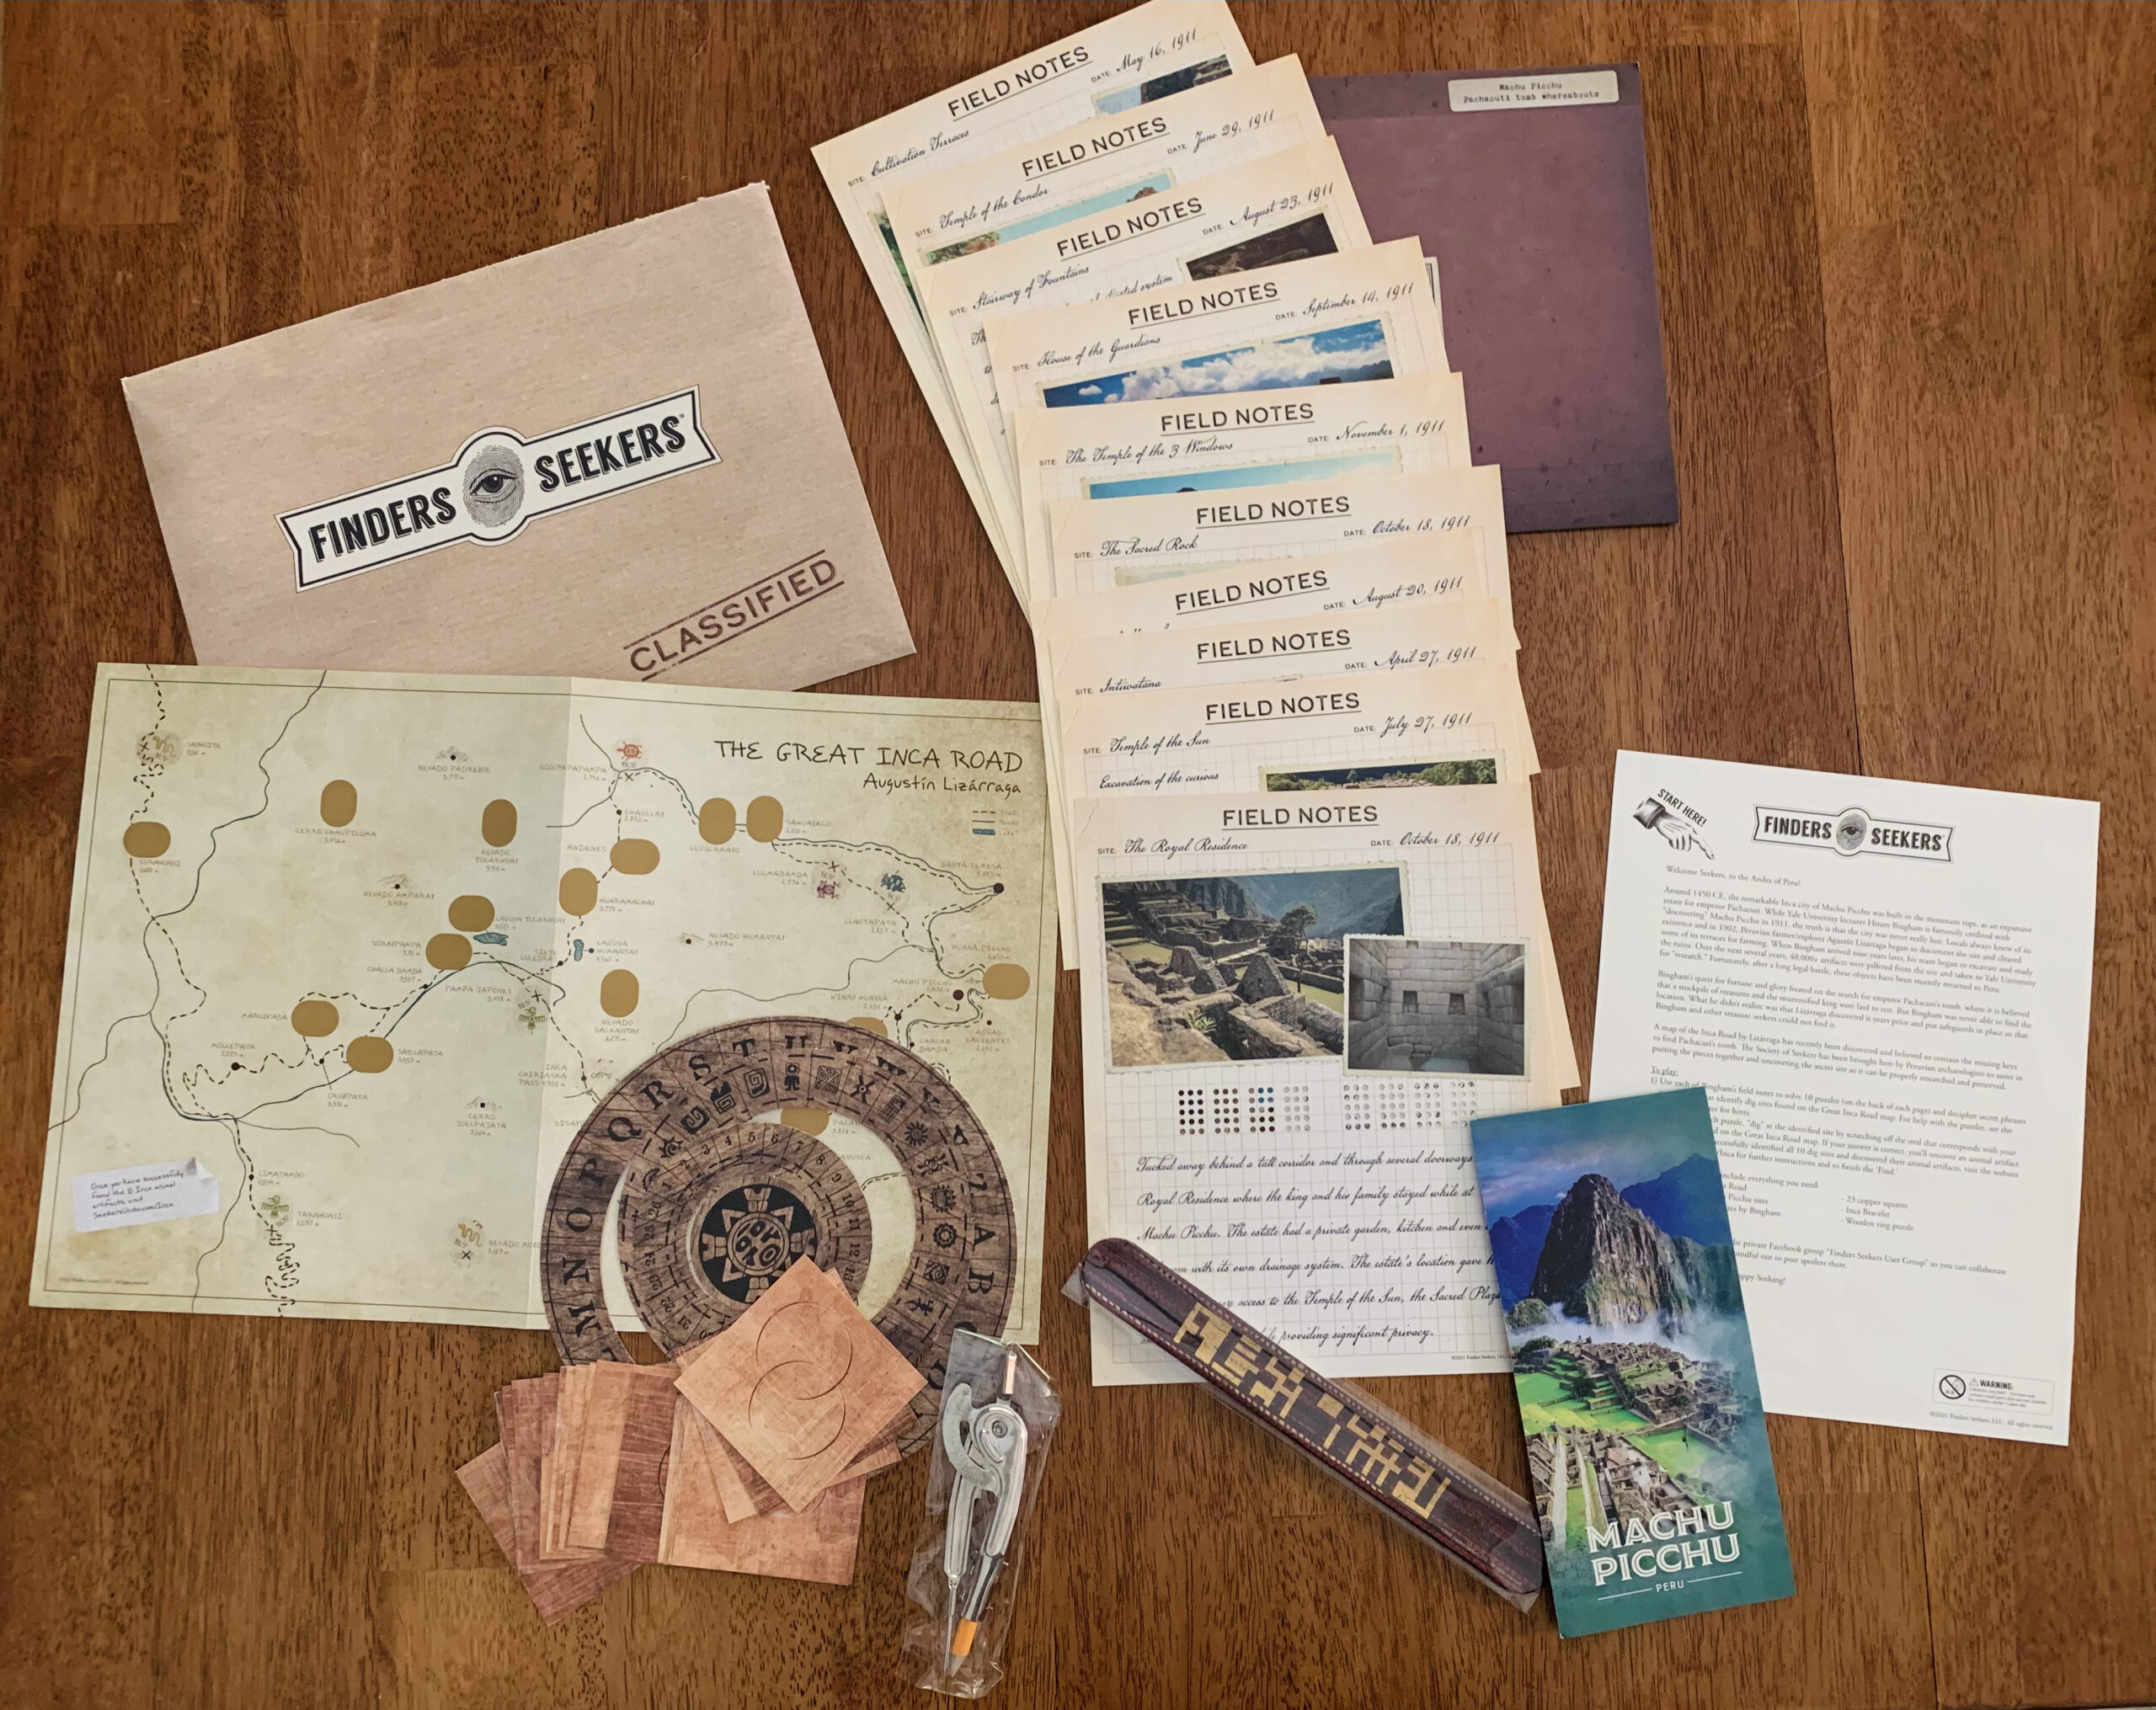 Machu Picchu review contents